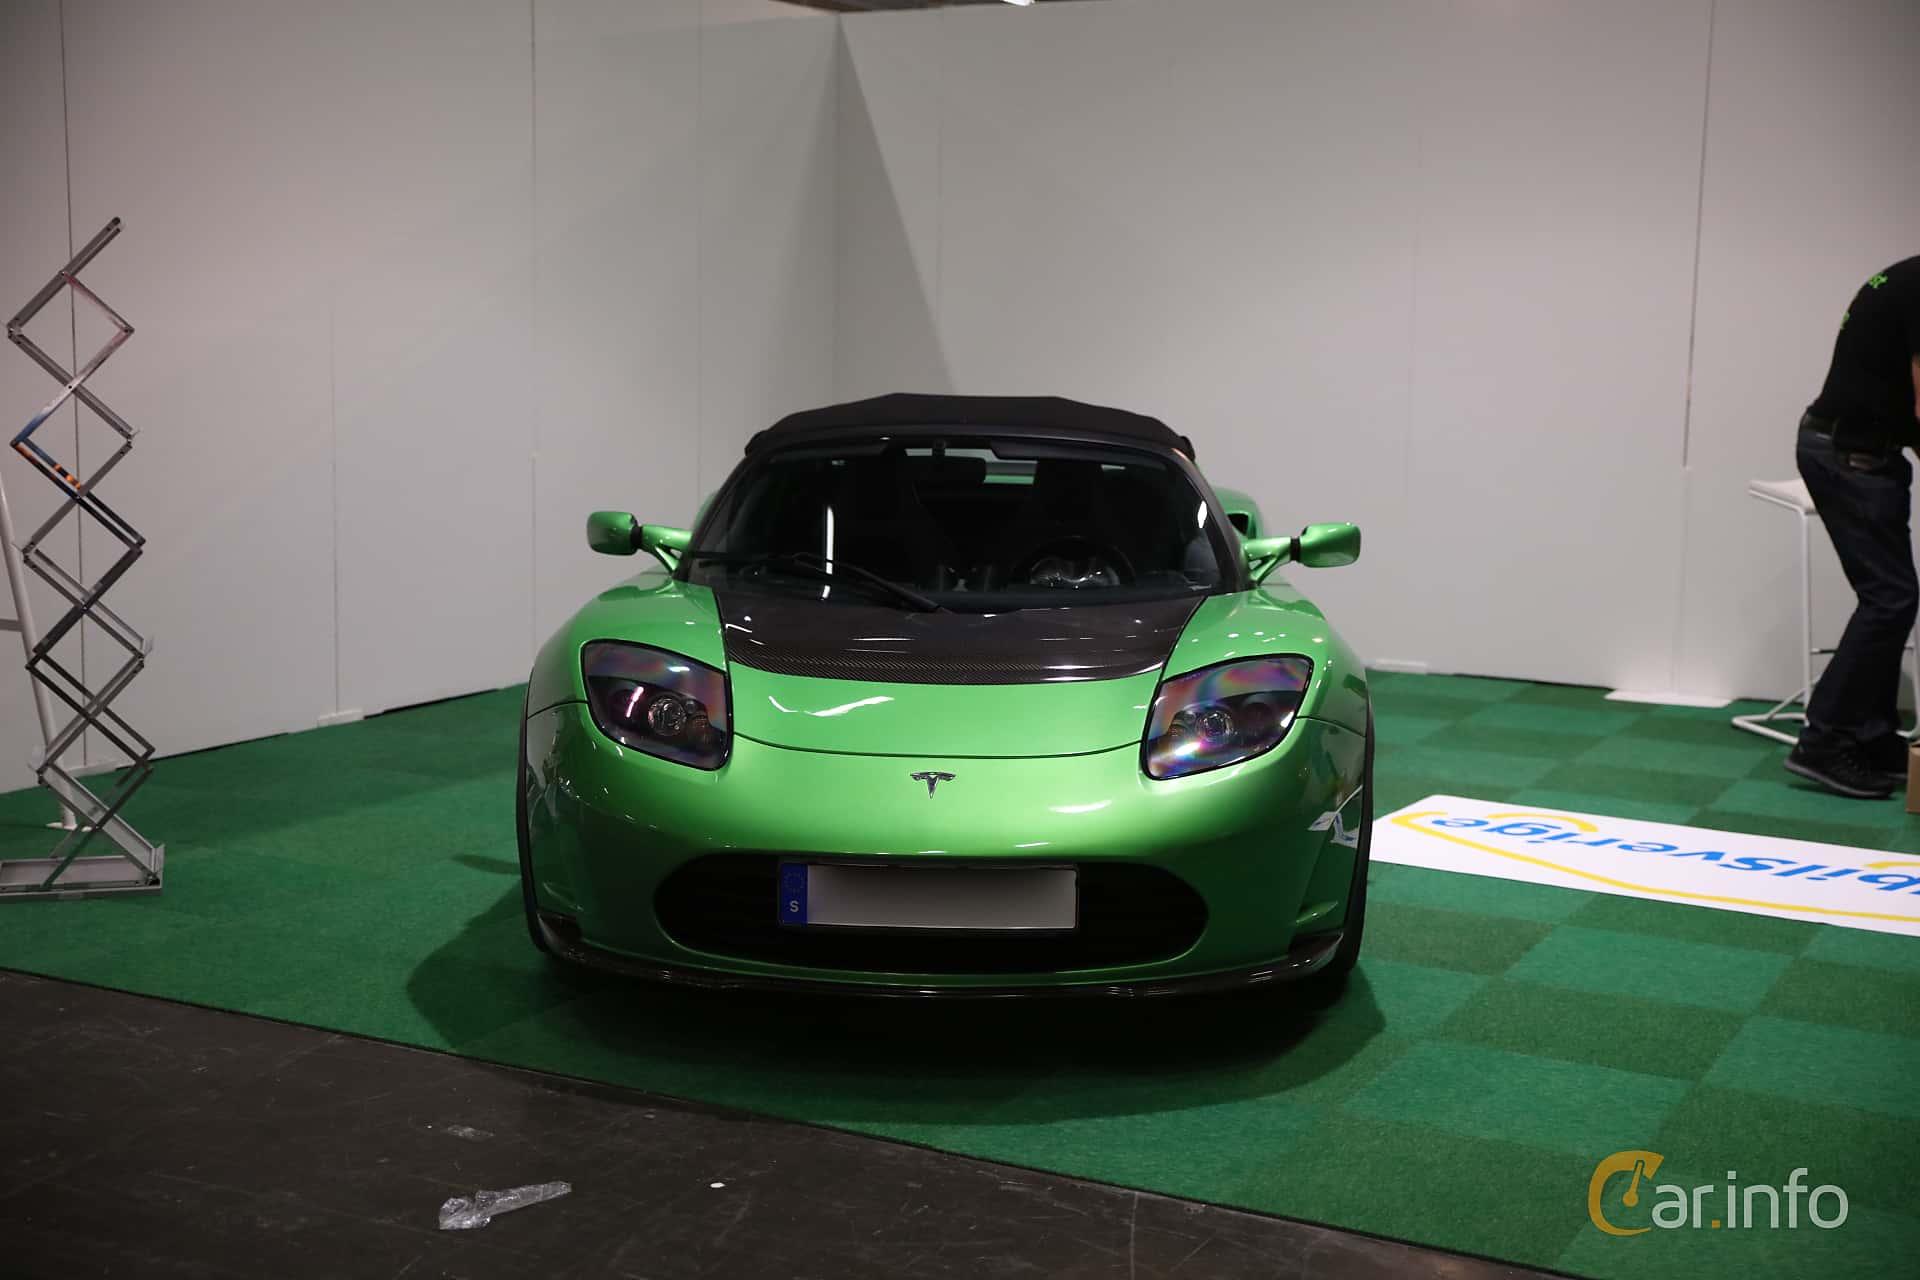 Tesla Roadster 2.5 Sport 53 kWh Single Speed, 292hp, 2012 at eCar Expo Göteborg 2018